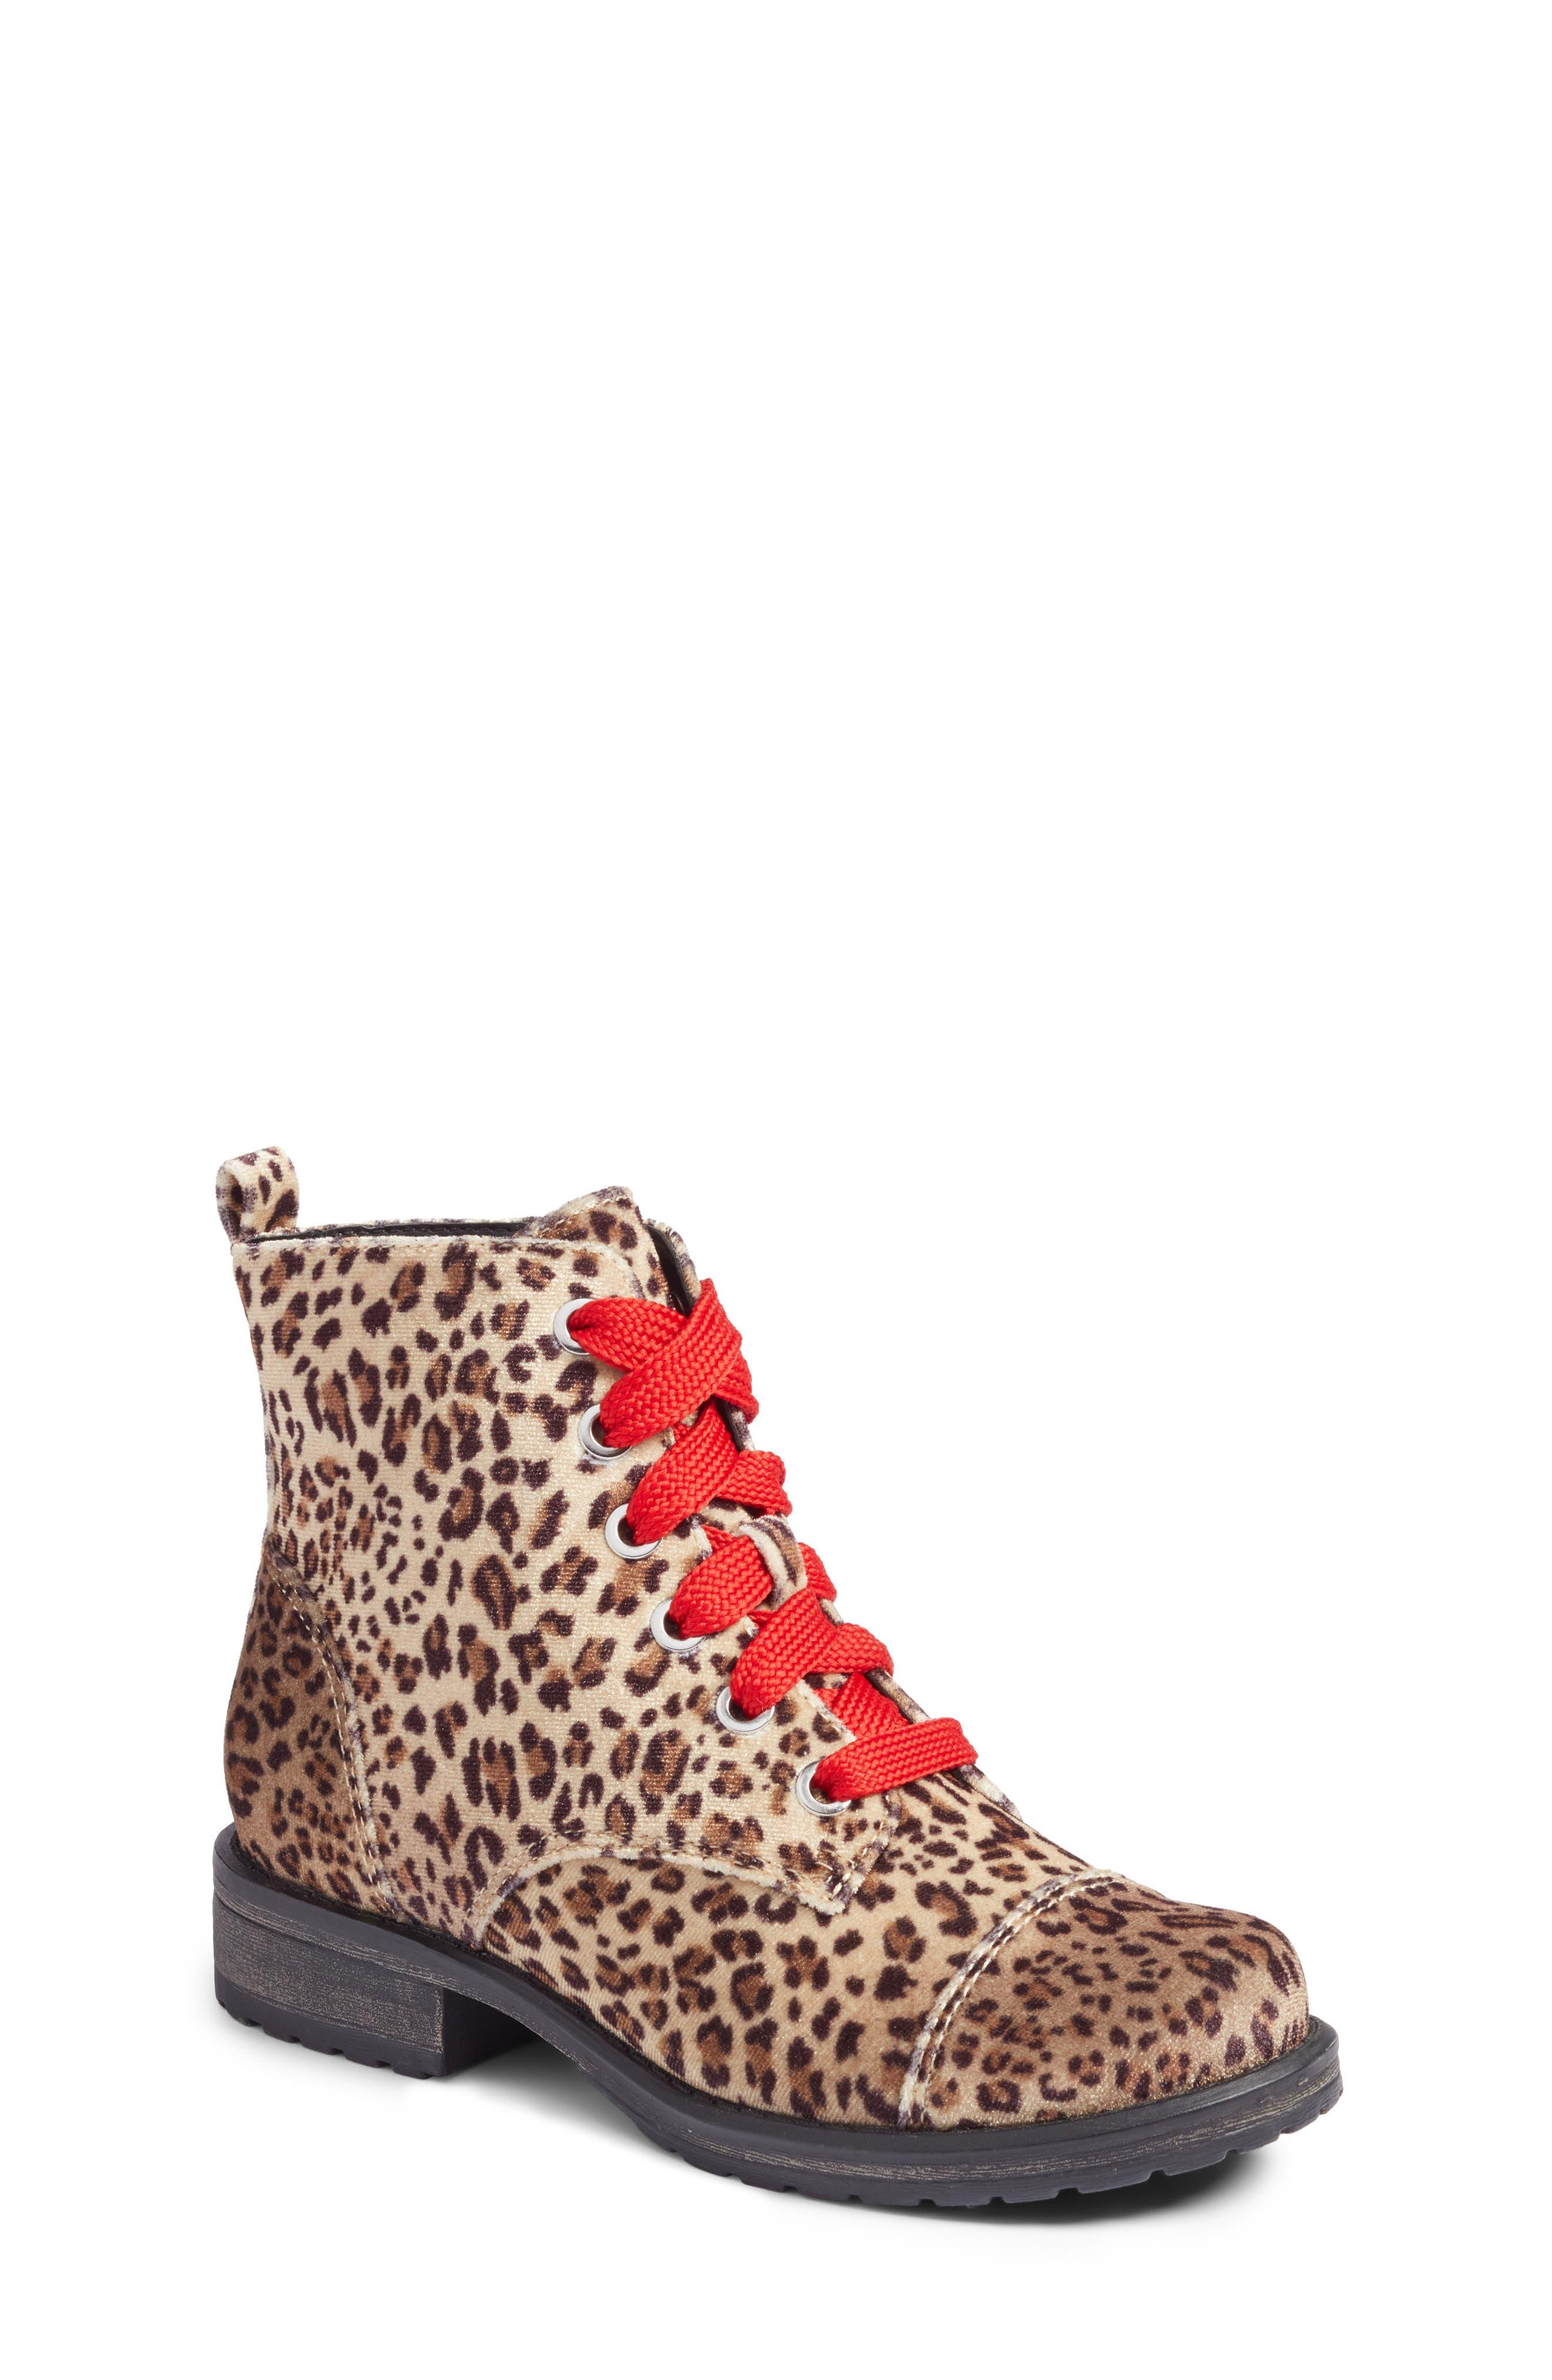 Lilla Combat Boot,                         Main,                         color, Leopard Velvet